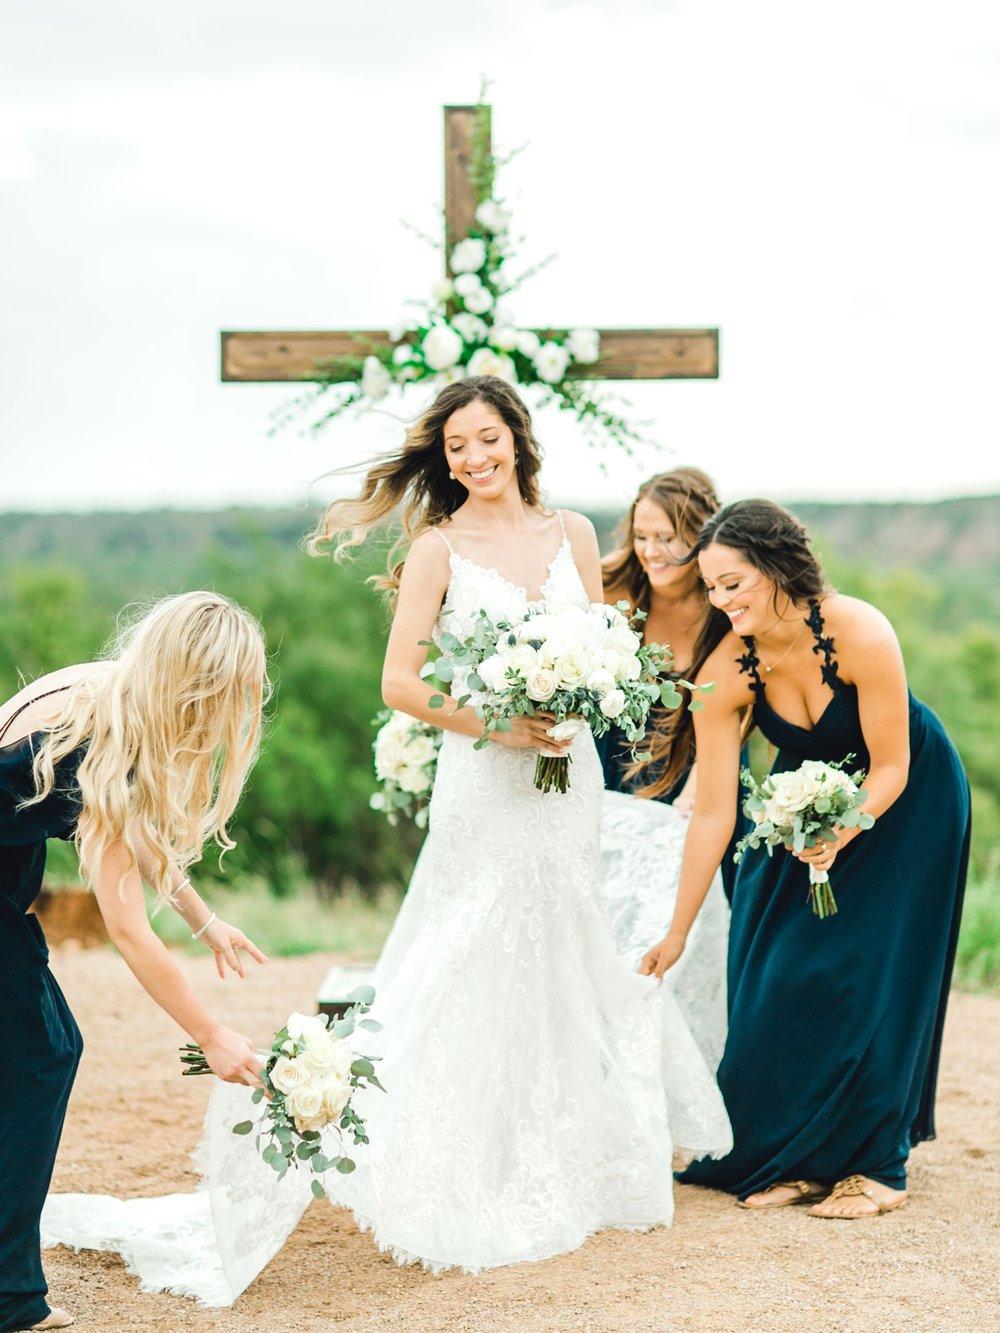 Ashley_John_English_Elegant_Texas_Wedding_Outdoors_Ranch_Caprock_Winery_ALLEEJ_0079.jpg